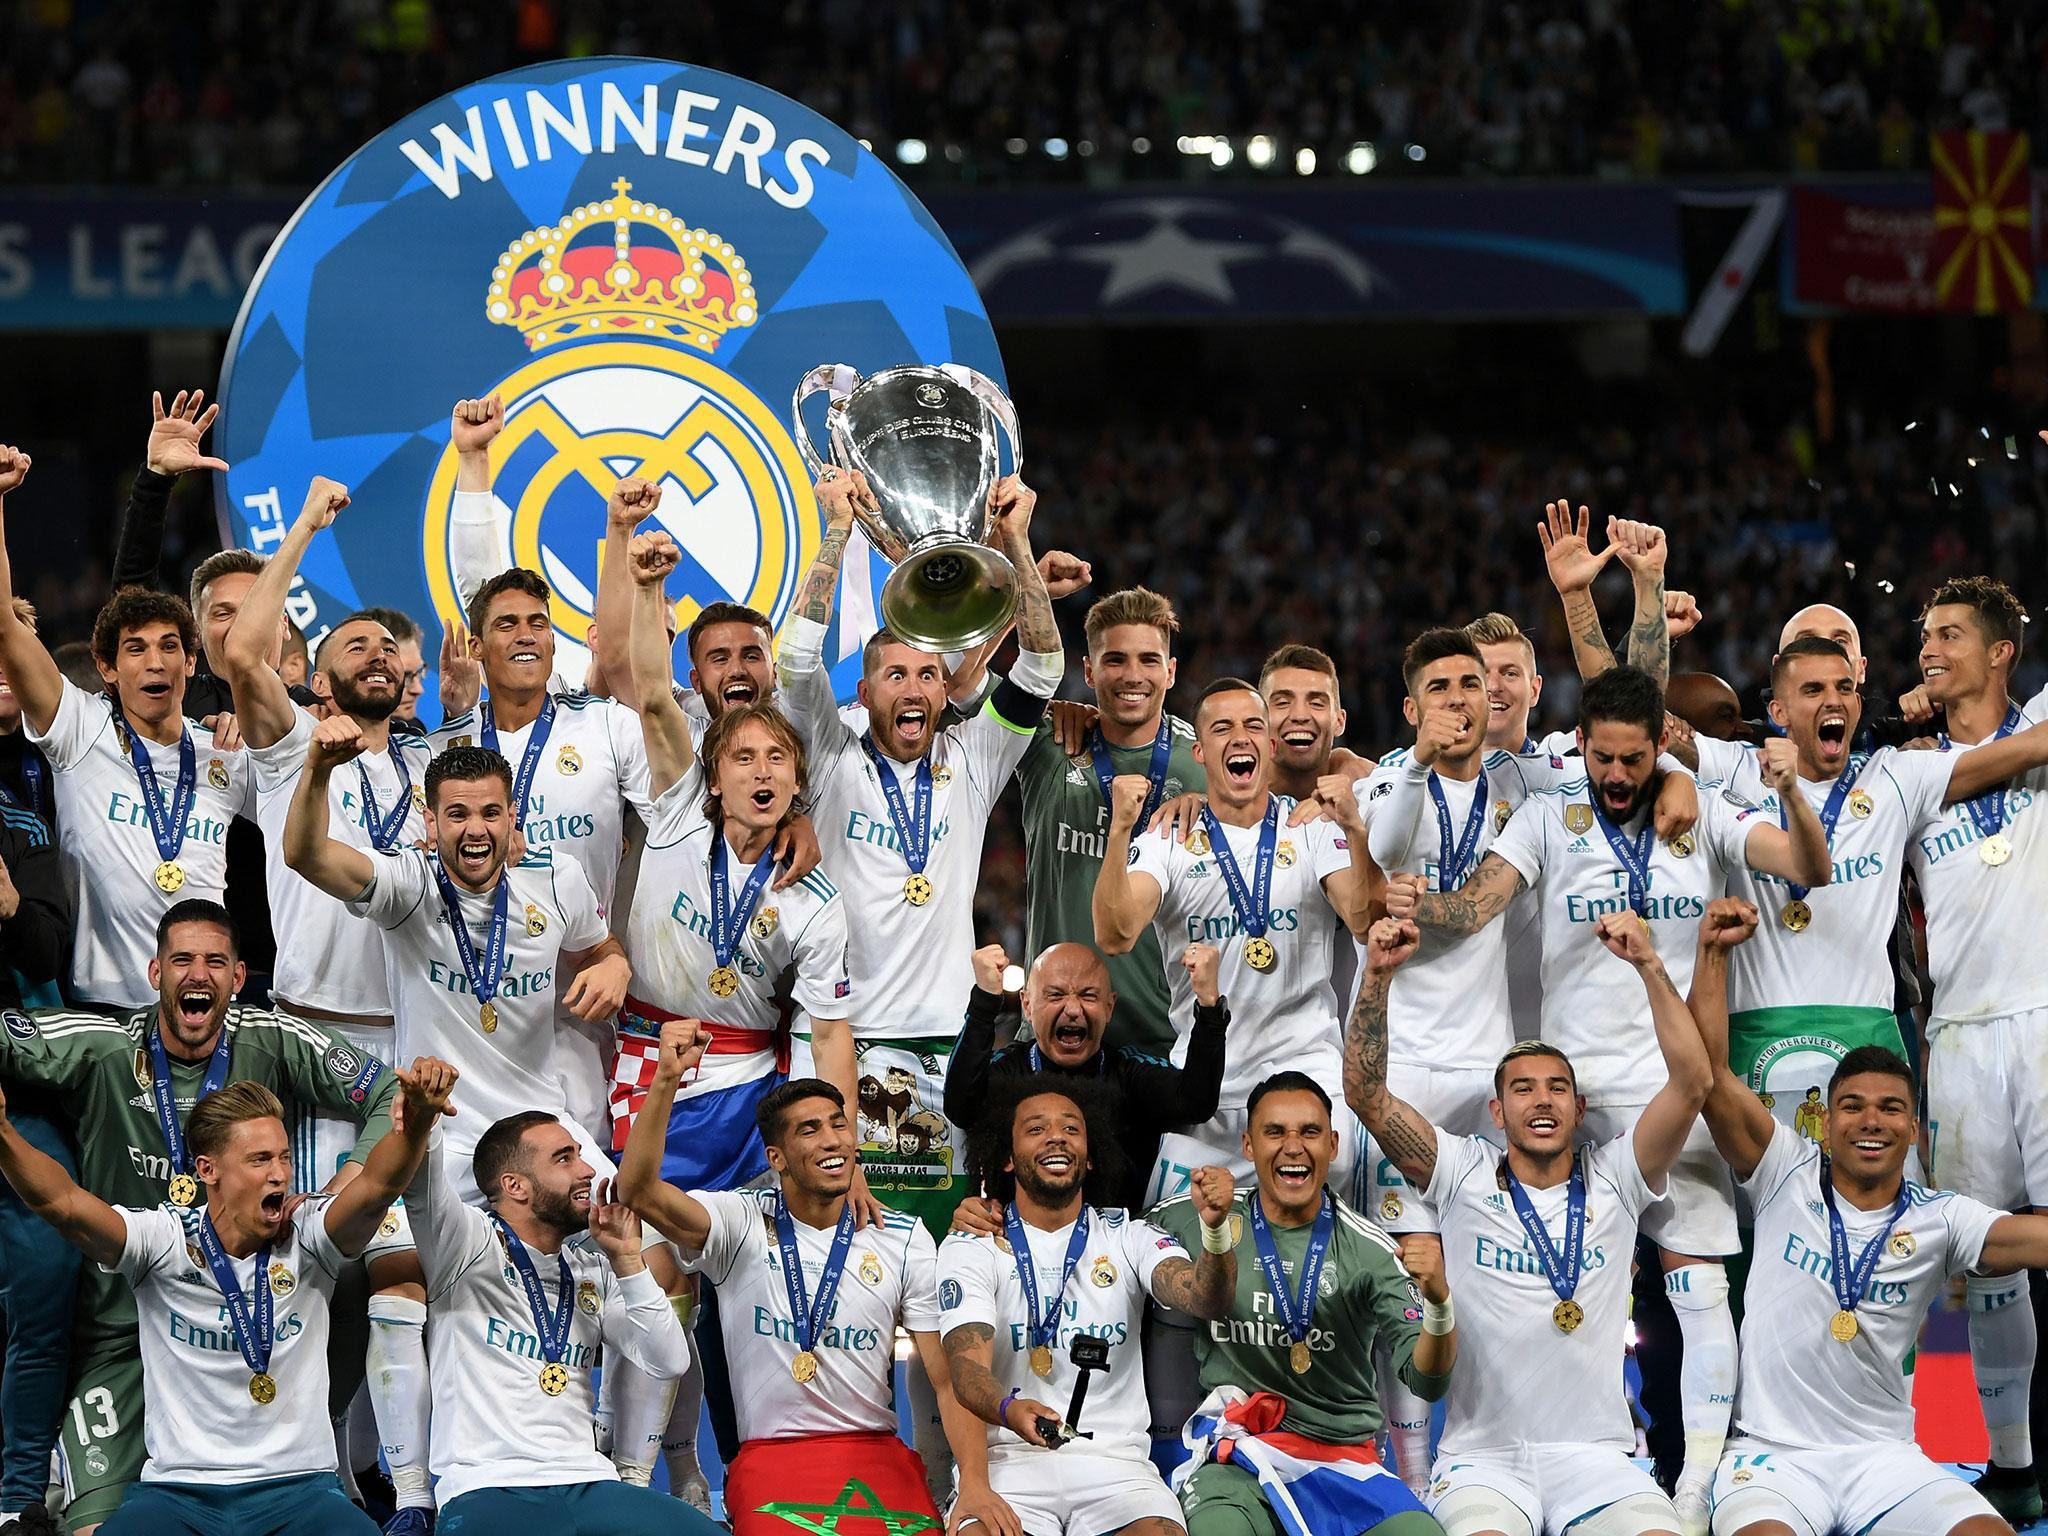 olah sudah menjadi liga domestik bagi Real Madrid Liverpool Terkapar, Sementara Real Madrid Membuktikan Diri Sebagai Singa yang Lapar Gelar